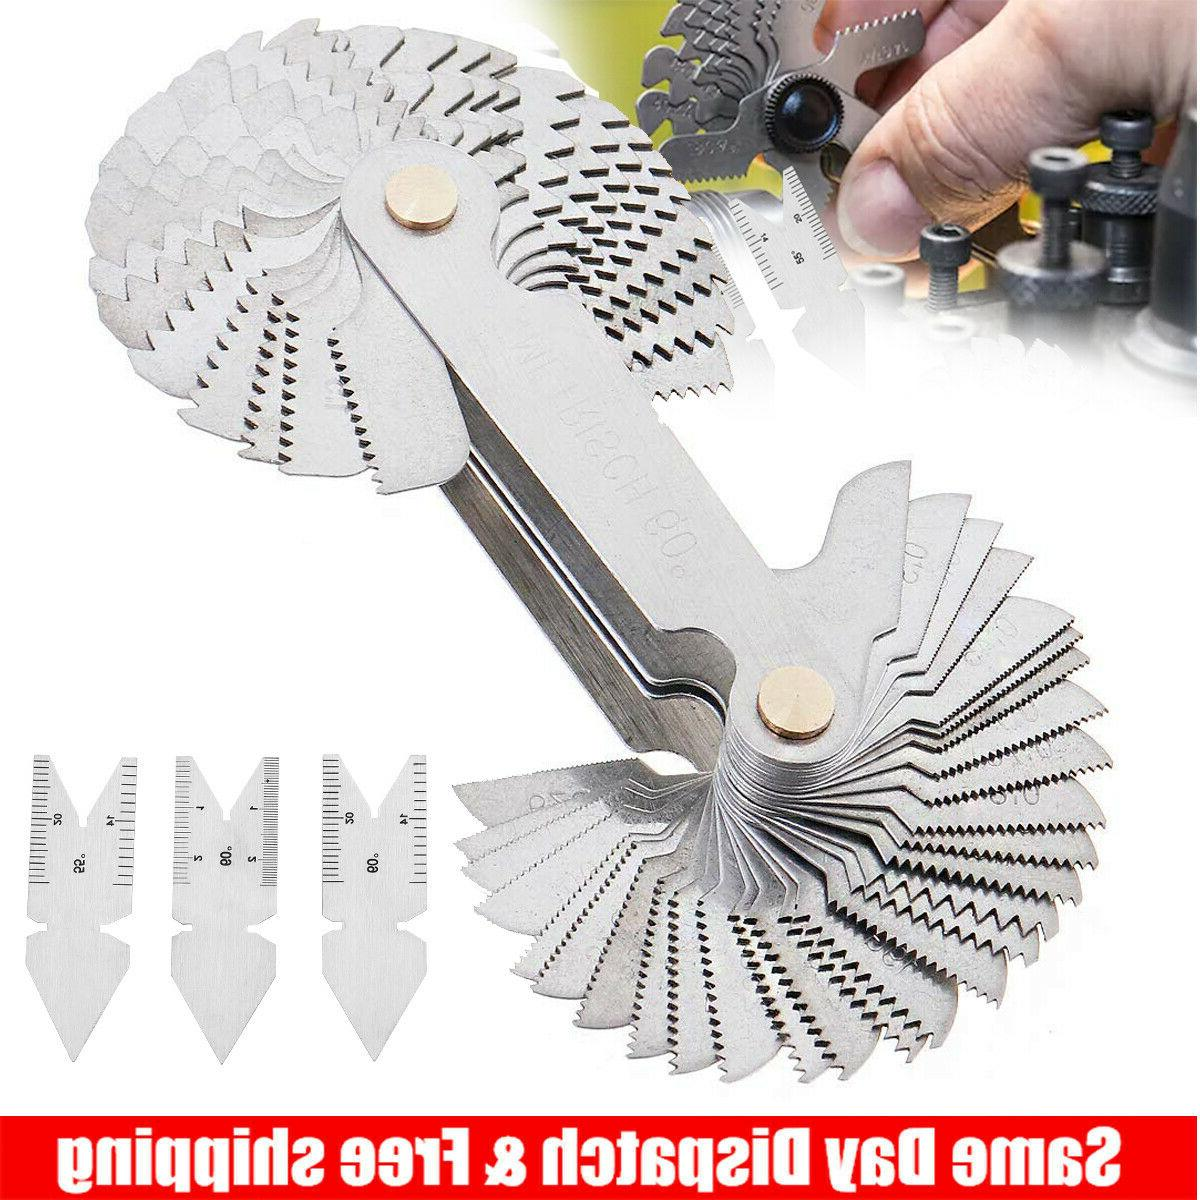 4pcs screw thread pitch cutting gauge tool